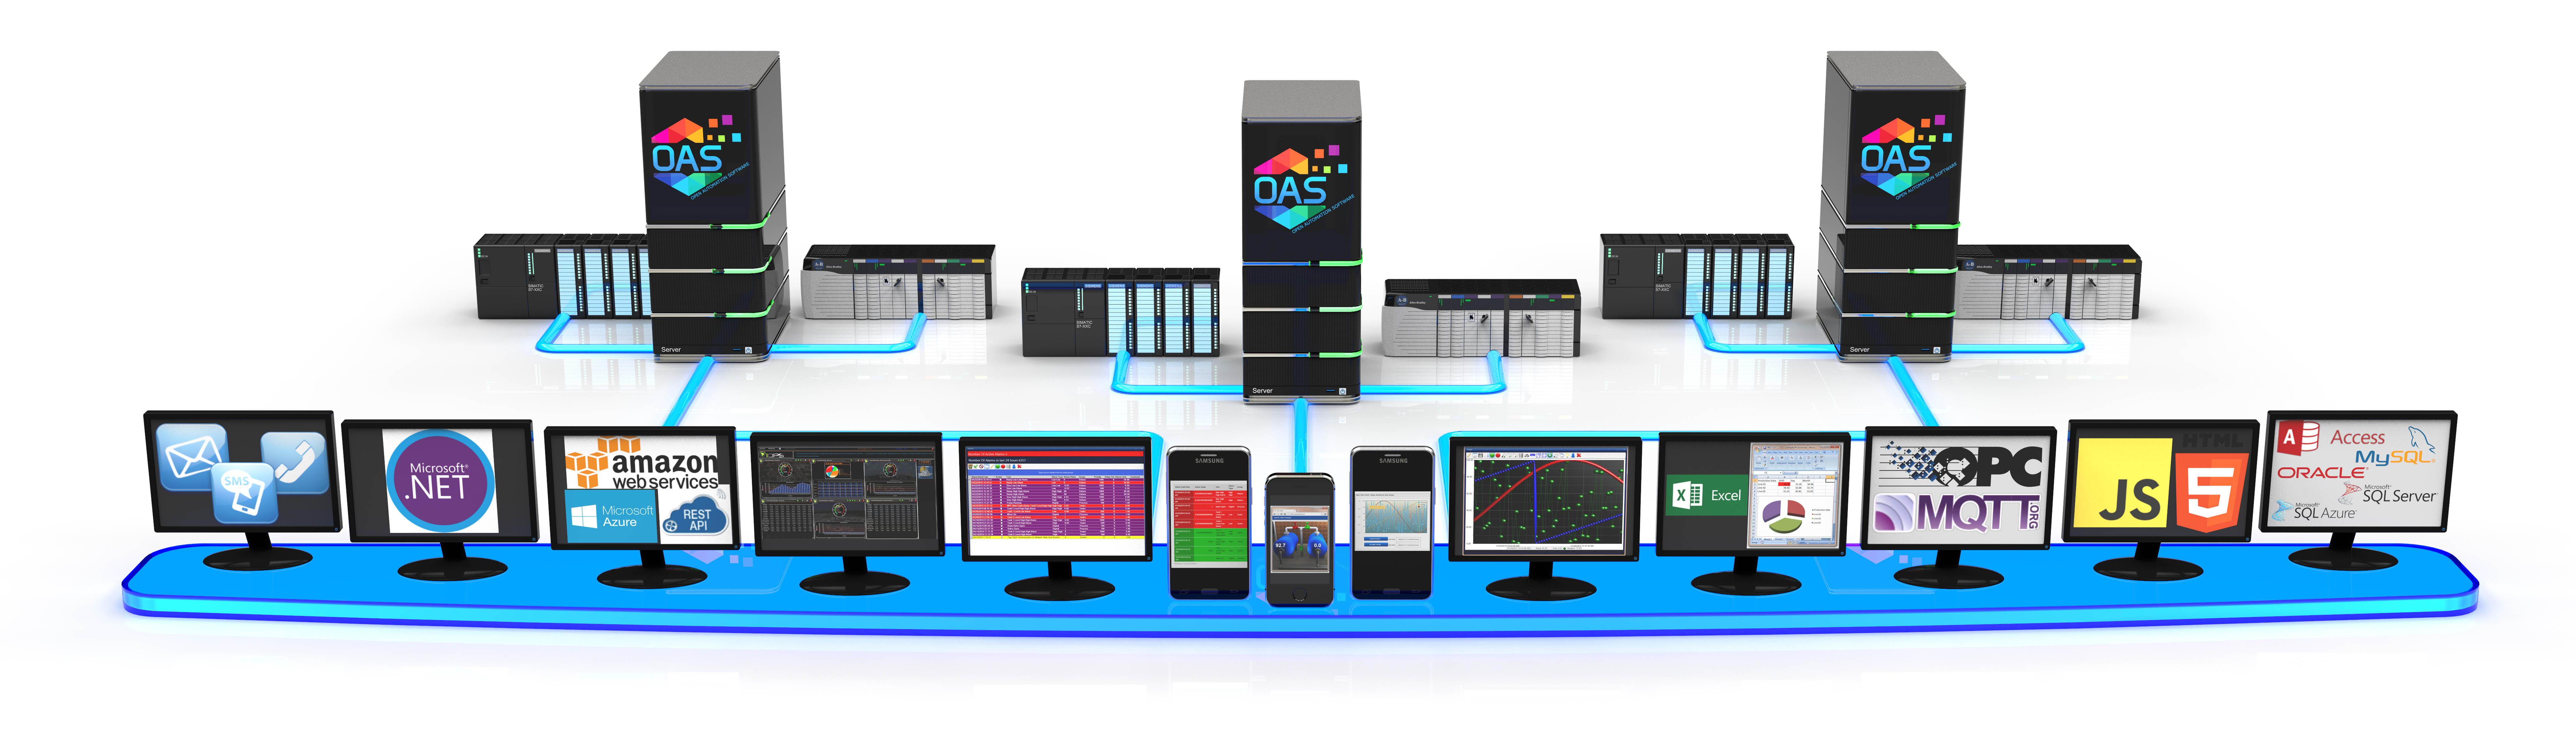 IoT Edge Computing Network